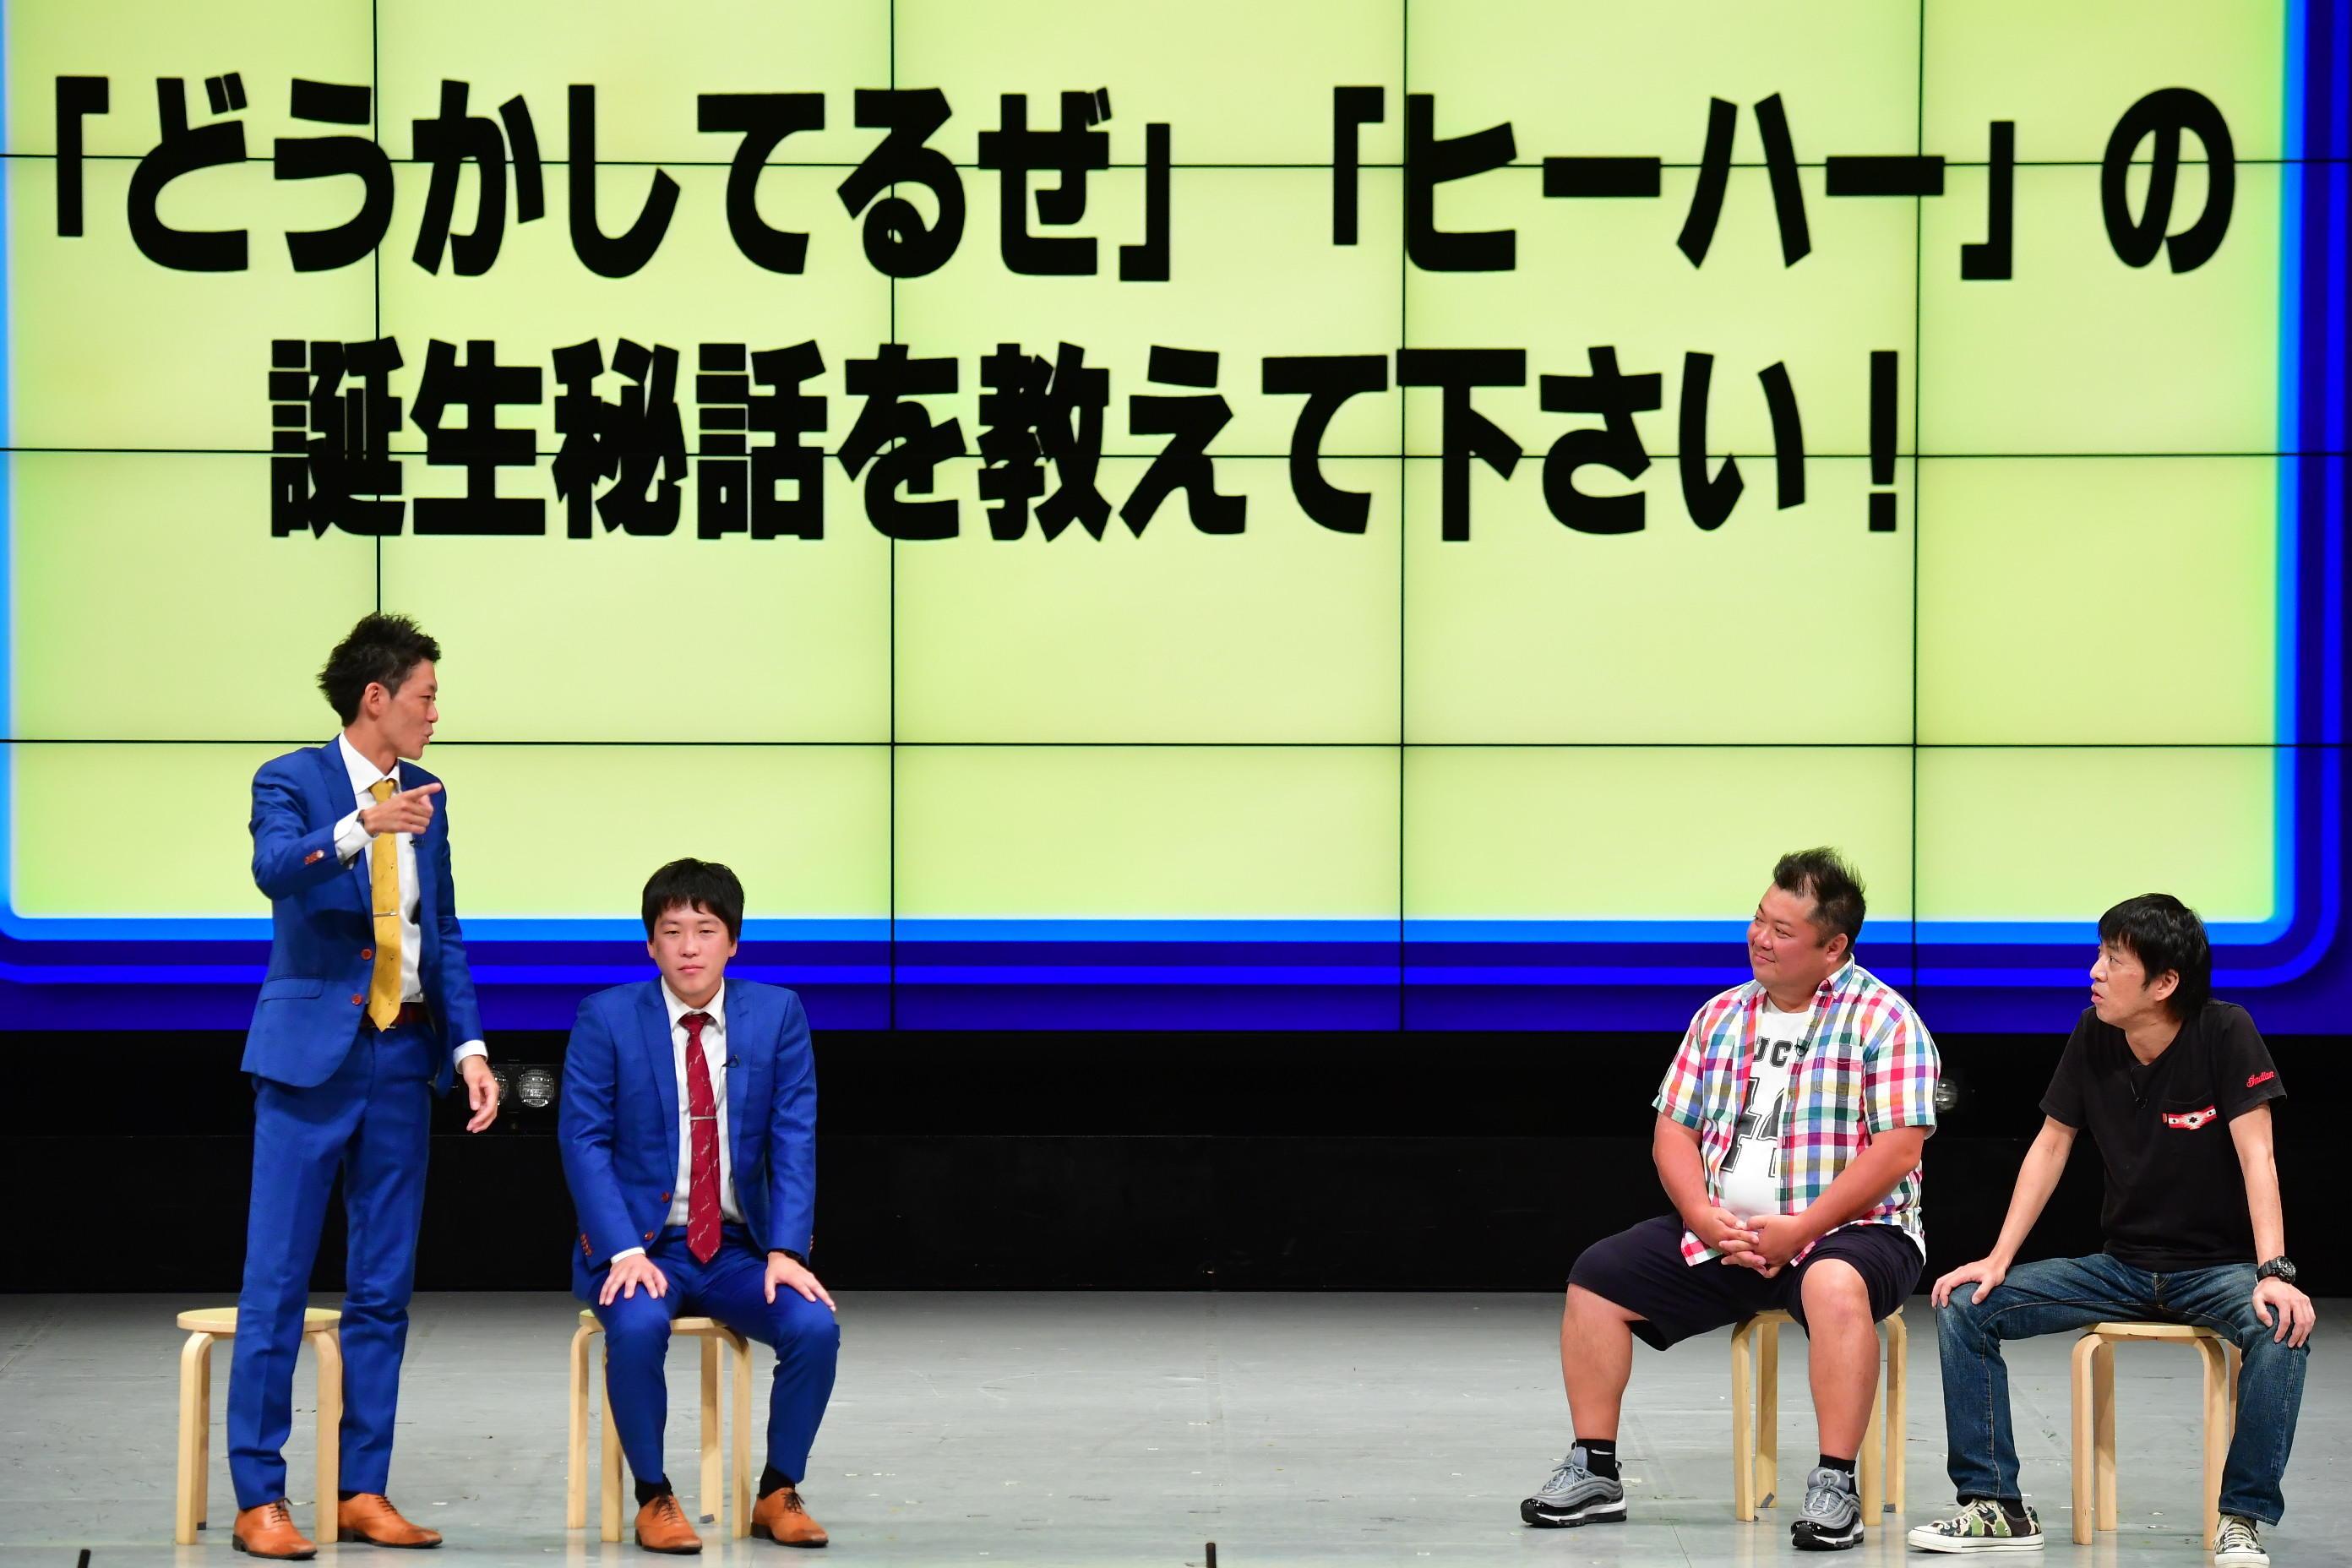 http://news.yoshimoto.co.jp/20180829234734-1b0a8143db1b3f31788421a24ffafbf8296ffd4e.jpg